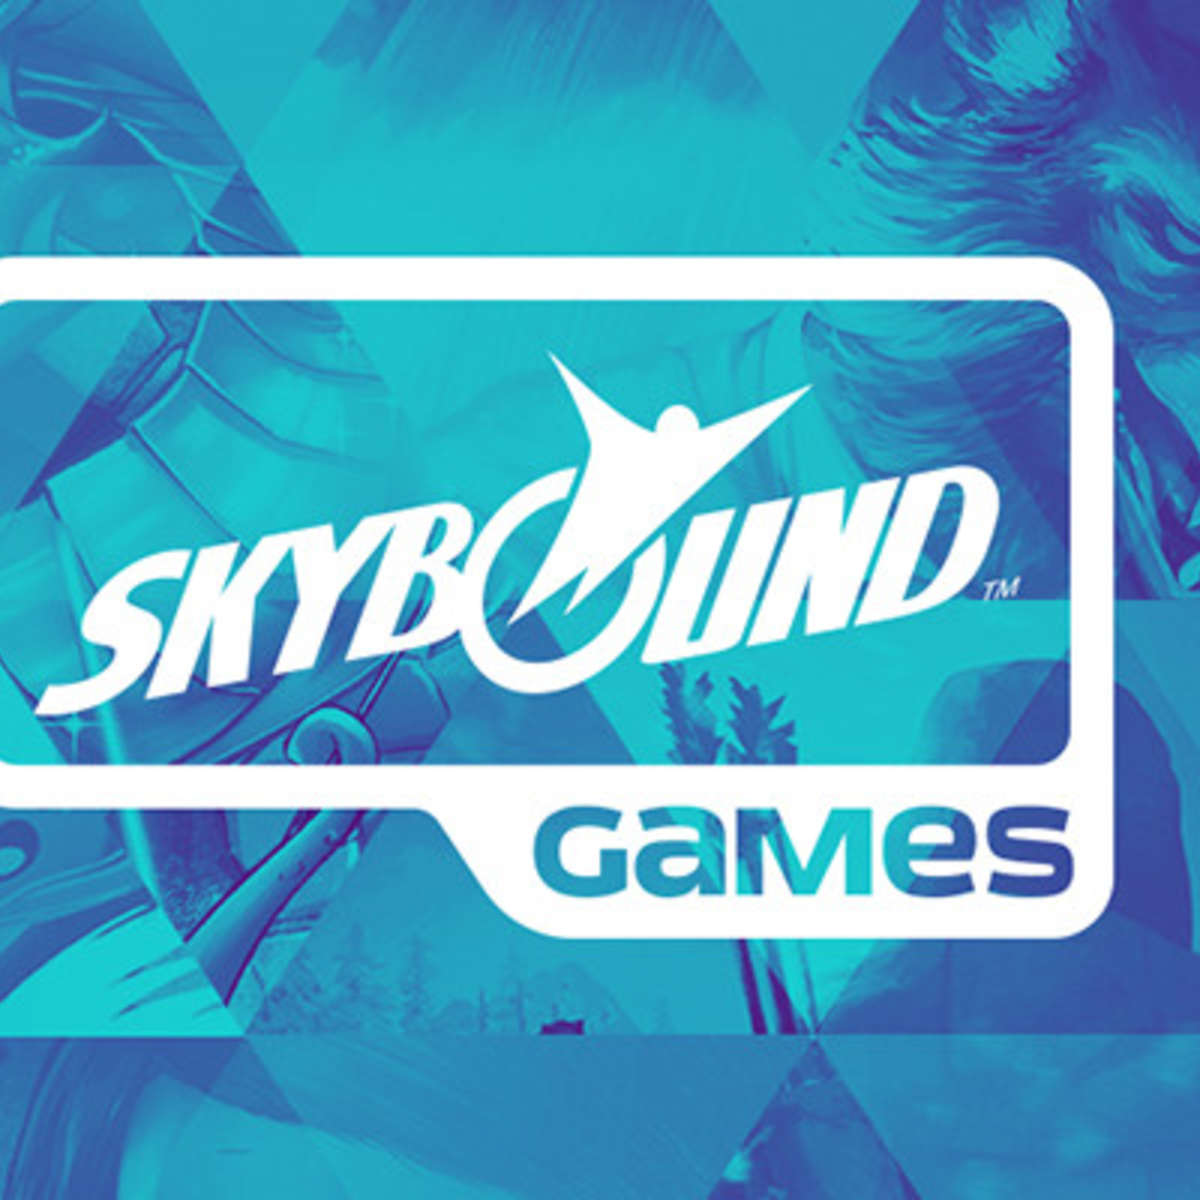 Skybound Games logo